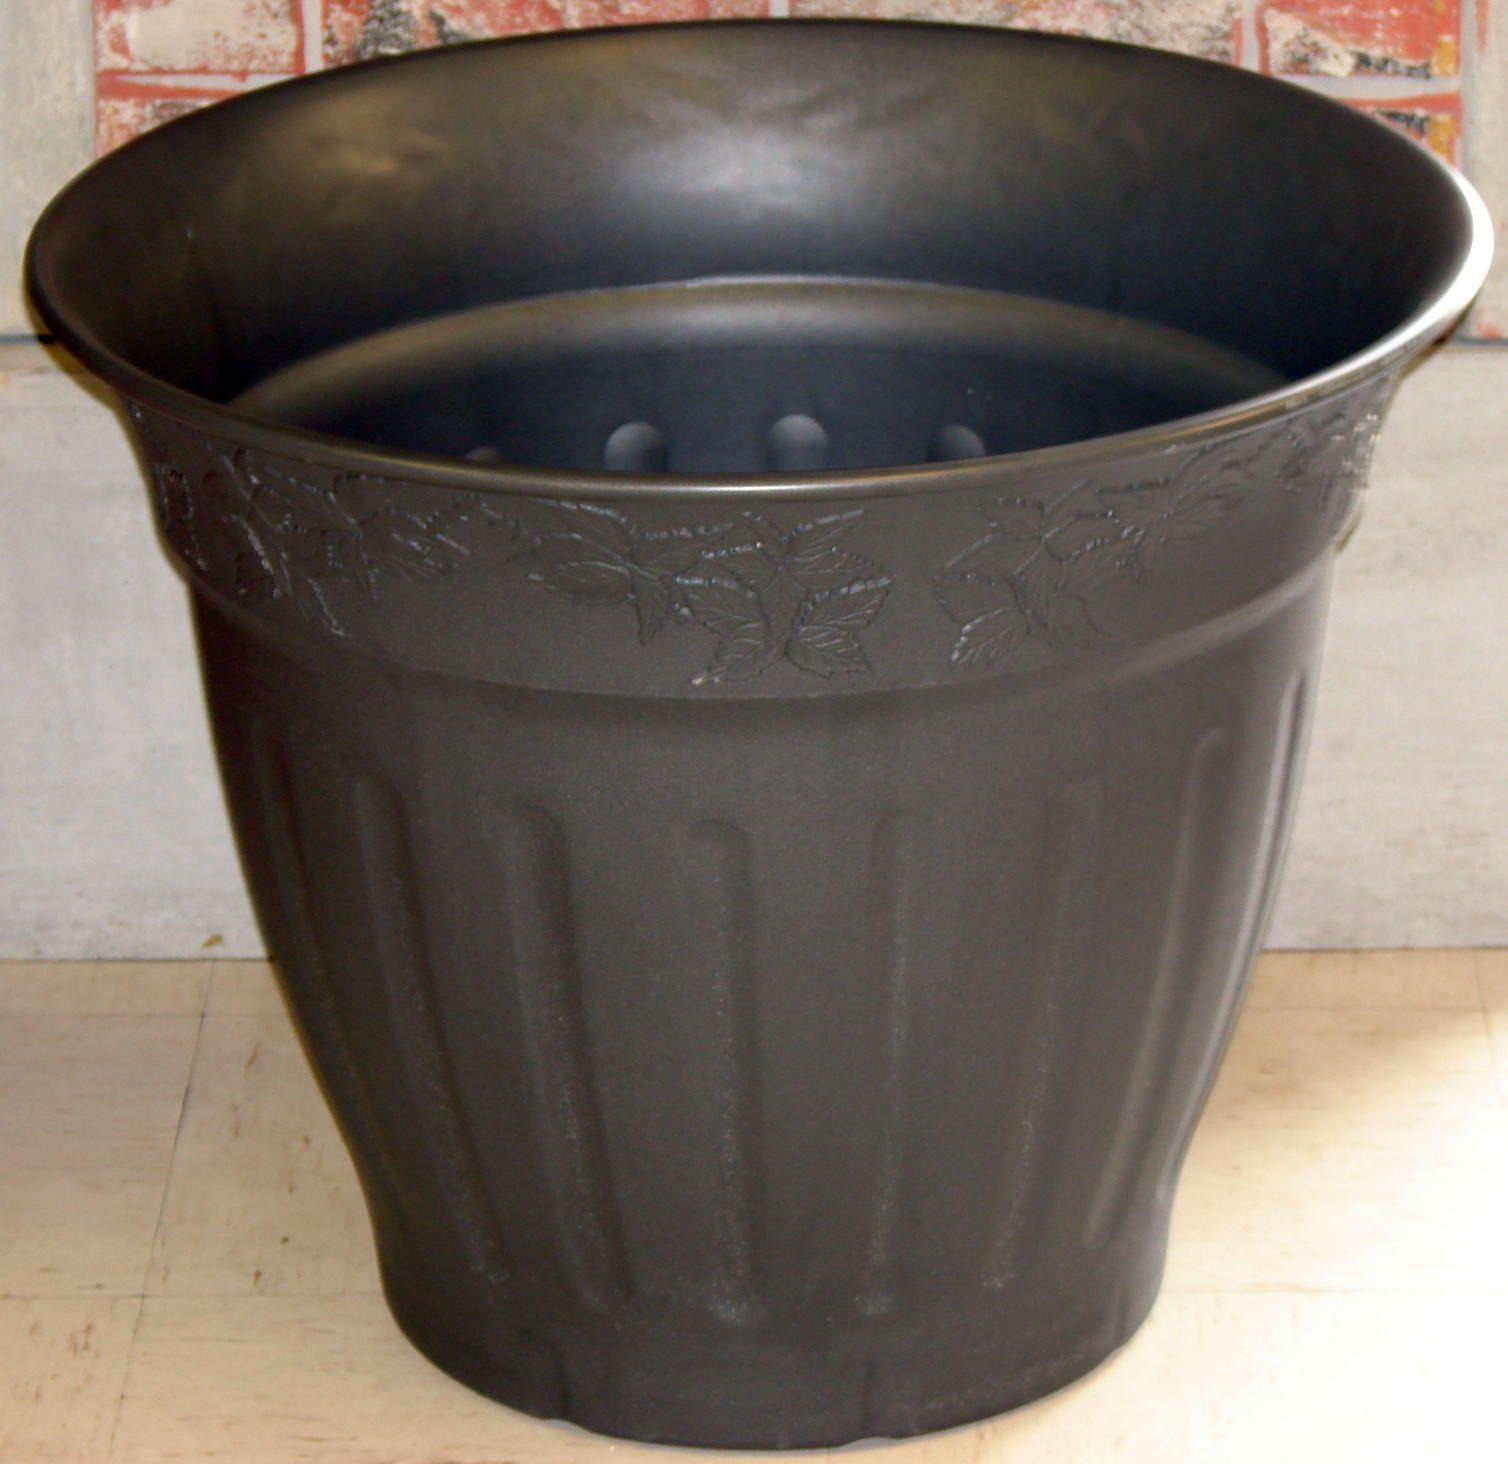 Huge Plastic Tub   Google Search · Garden PotsTubPlastic